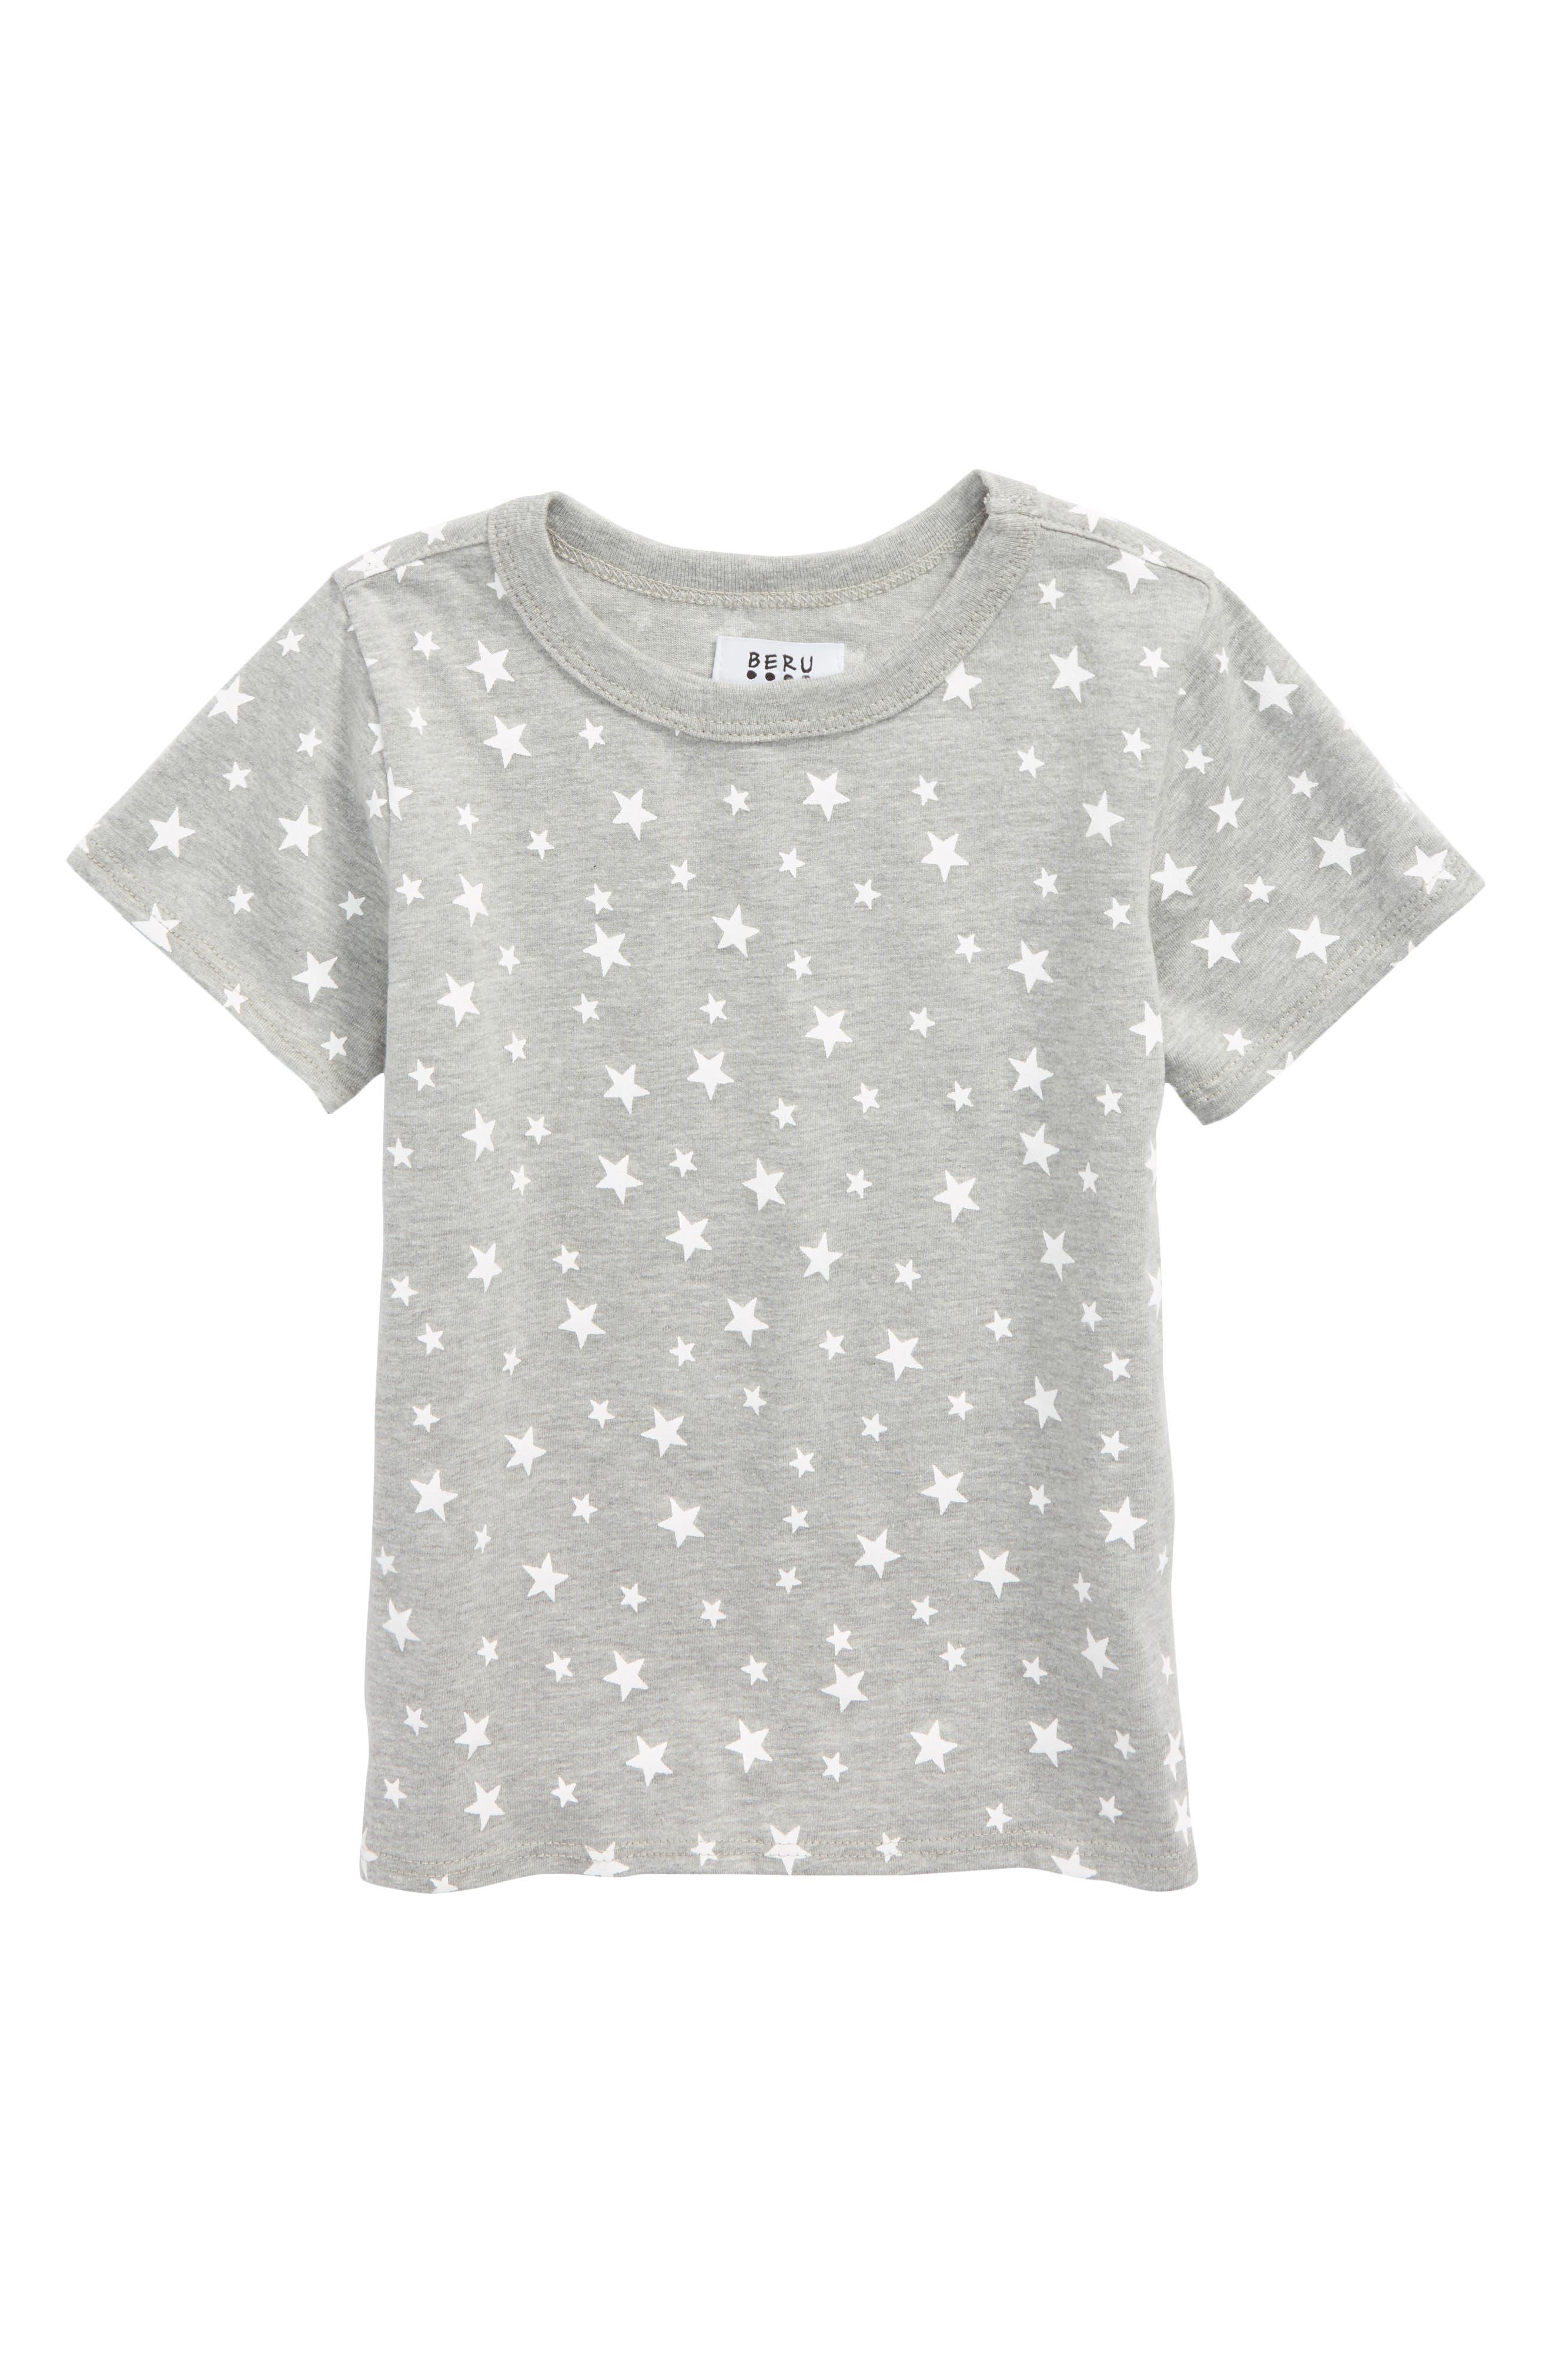 Alternate Image 1 Selected - Beru Enzo Star Print T-Shirt (Toddler Boys & Little Boys)